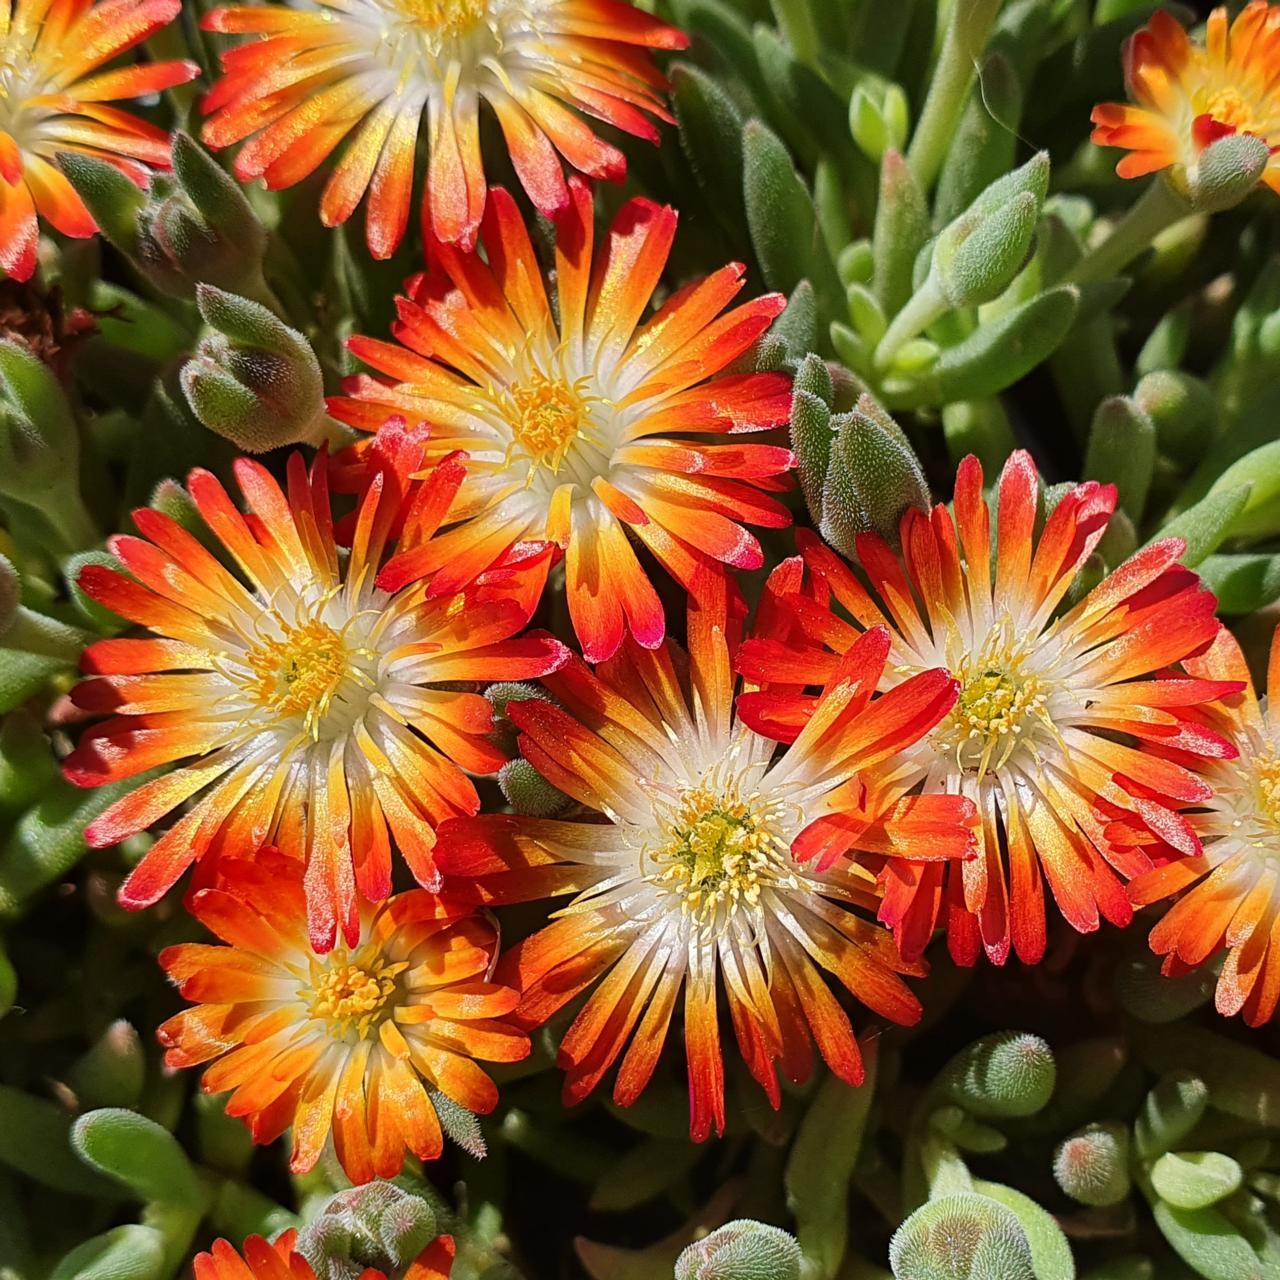 Delosperma 'Lido Orange with Eye' plant